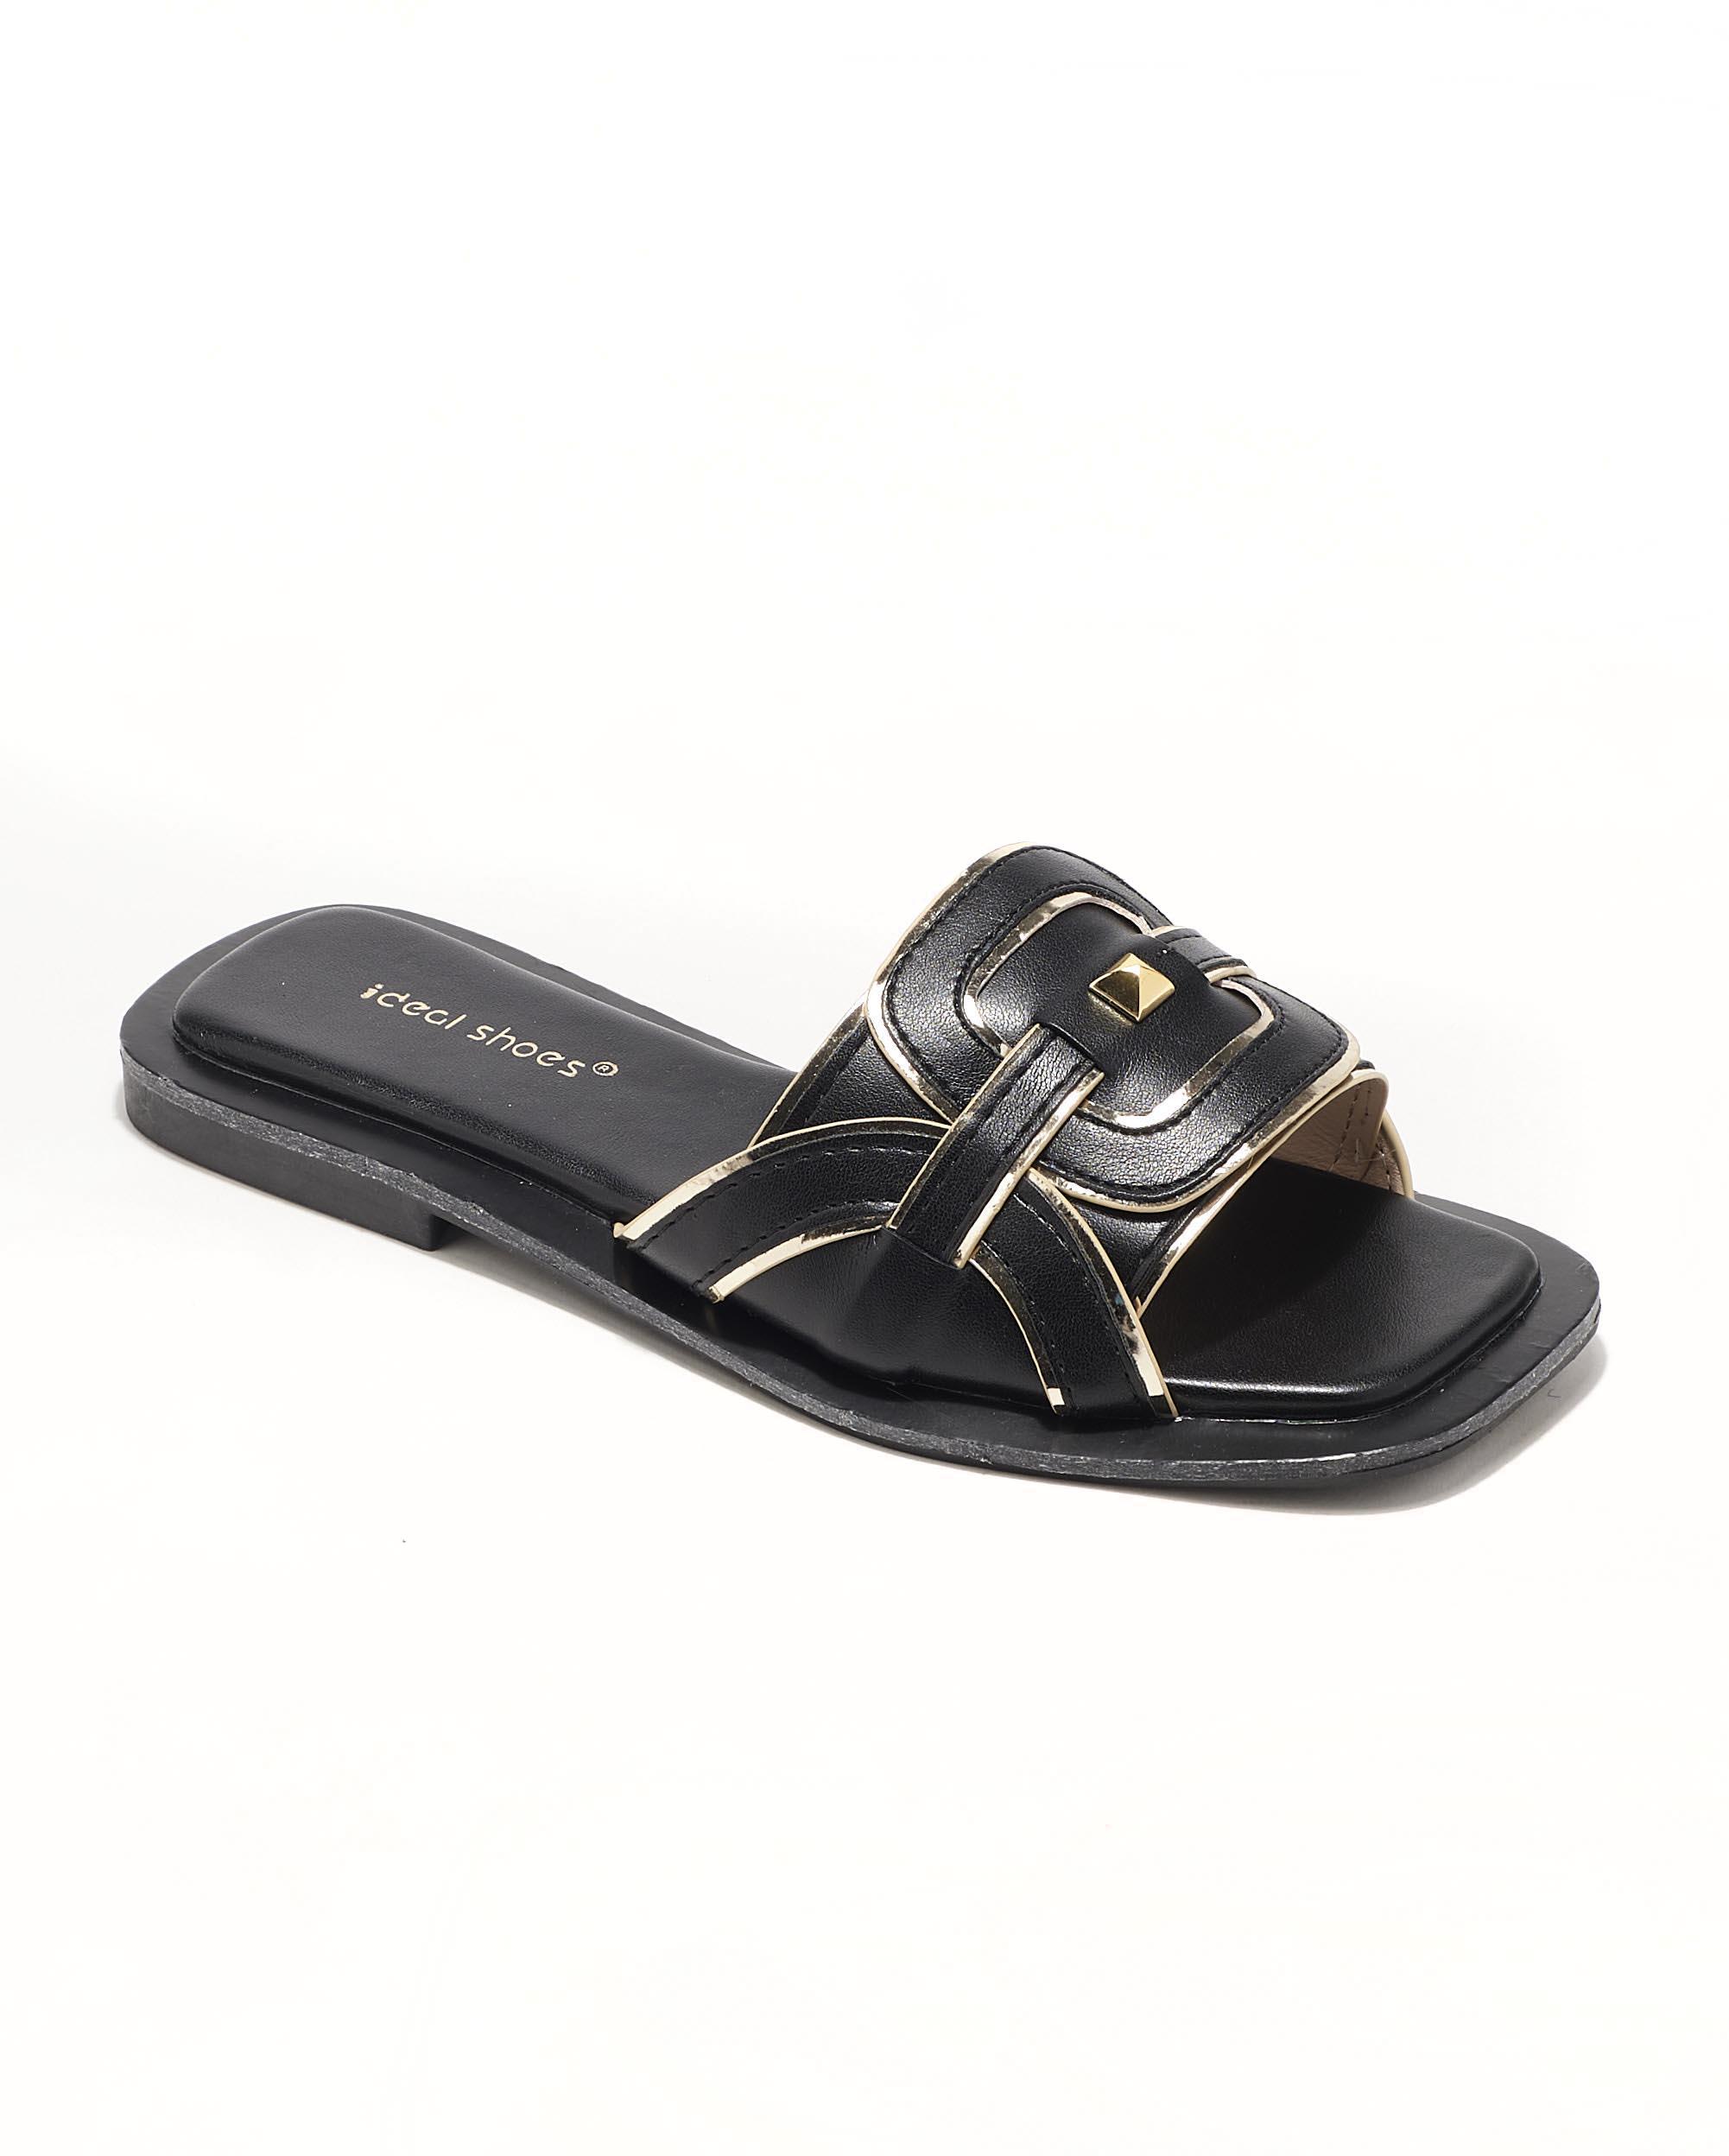 Mules Femme - Mule Plate Noir Jina - 3530